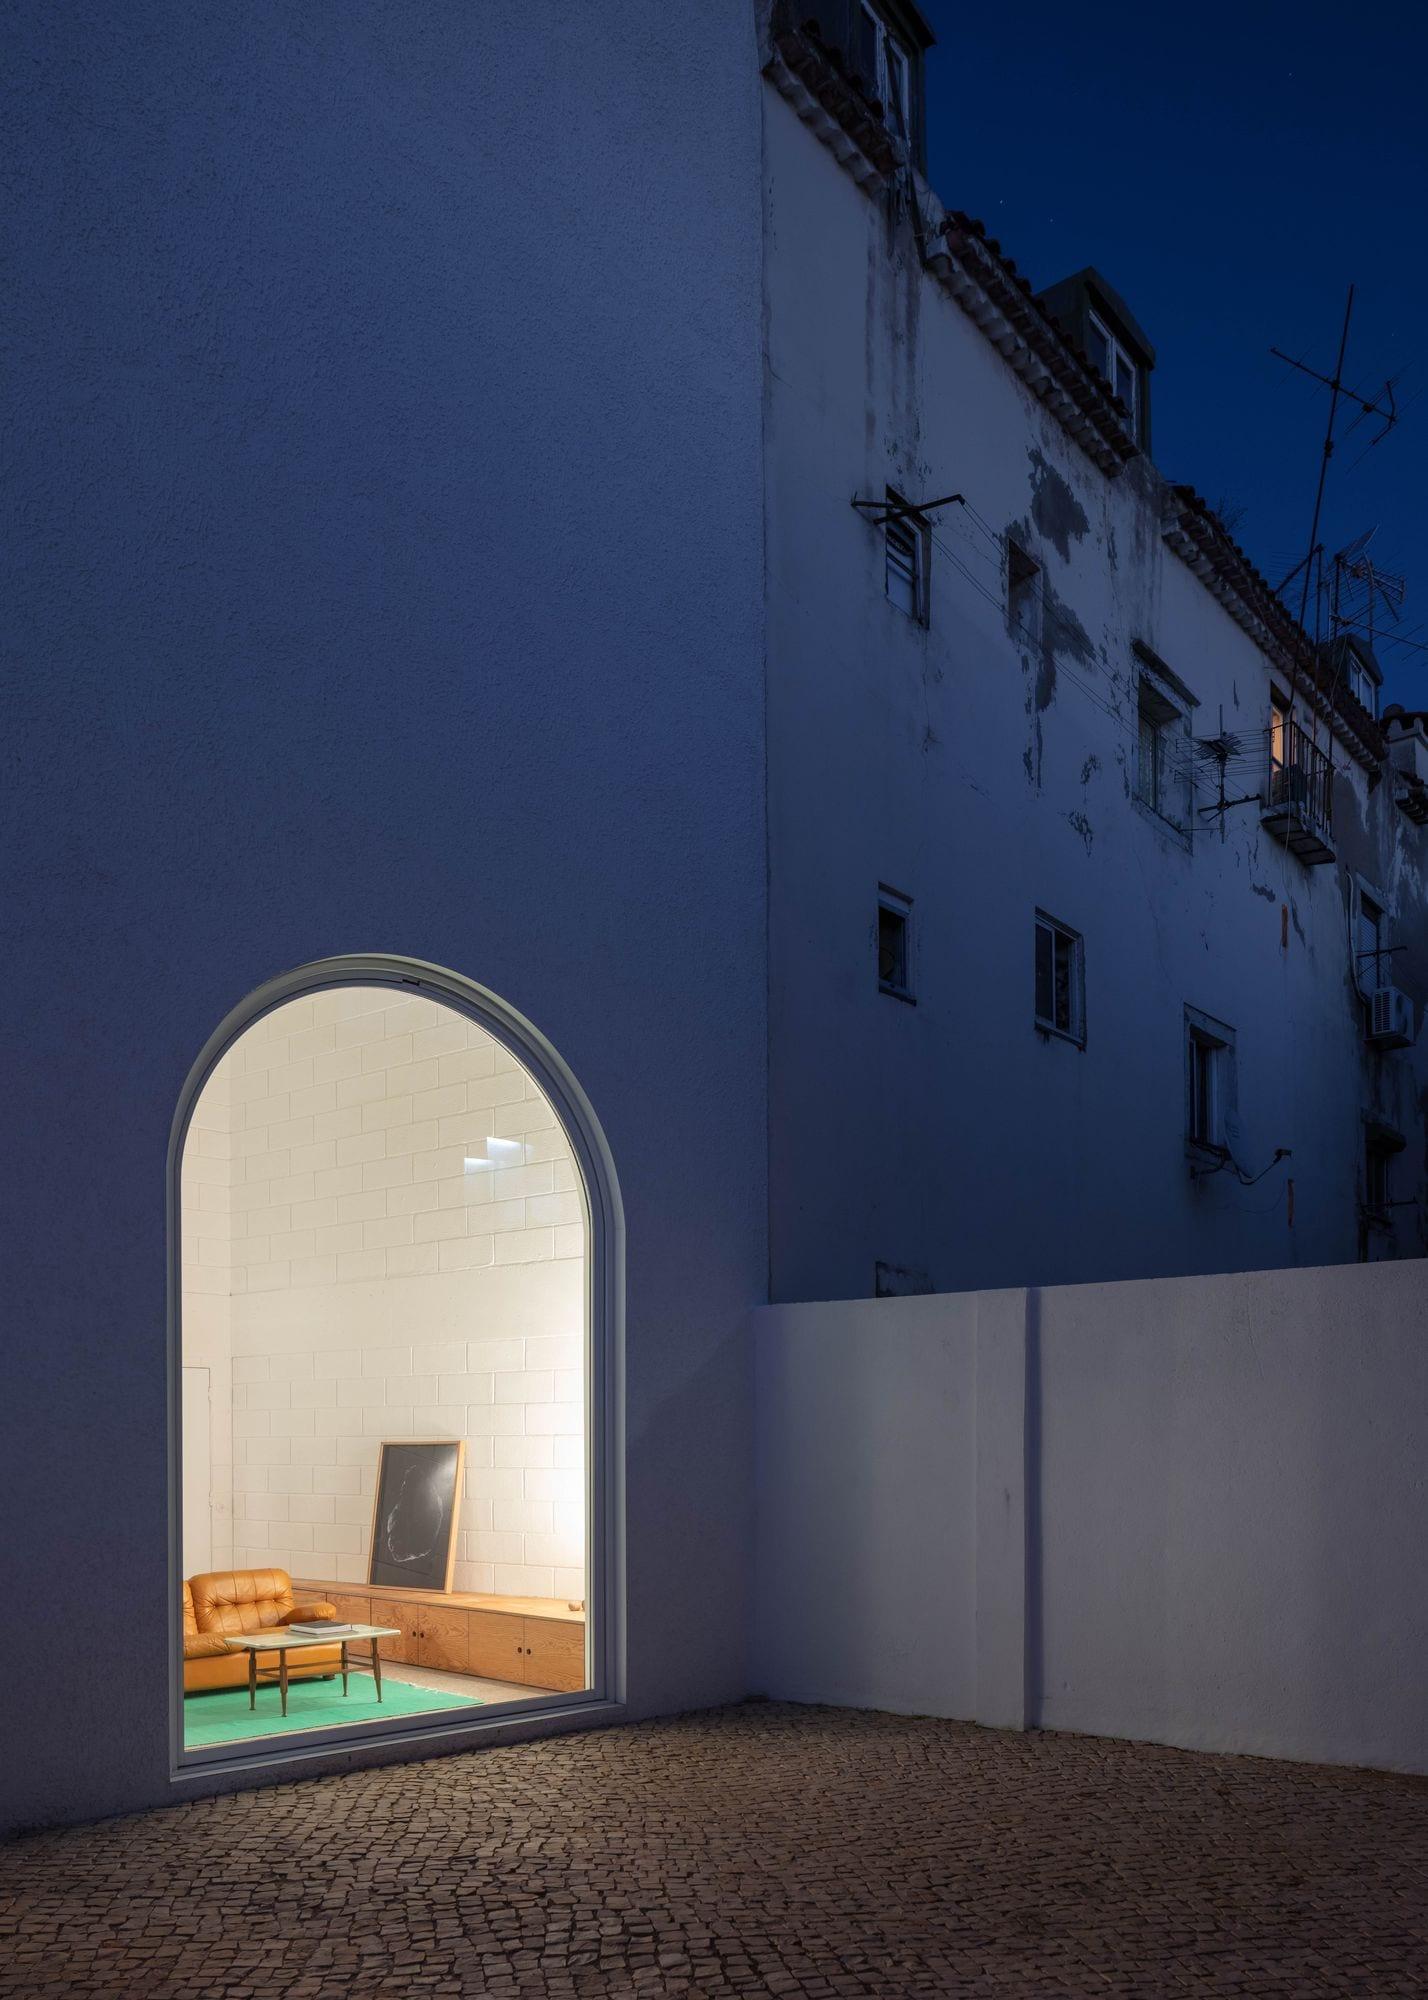 Dodged House In Lisbon By Leopold Banchini Daniel Zamarbide Yellowtrace 27